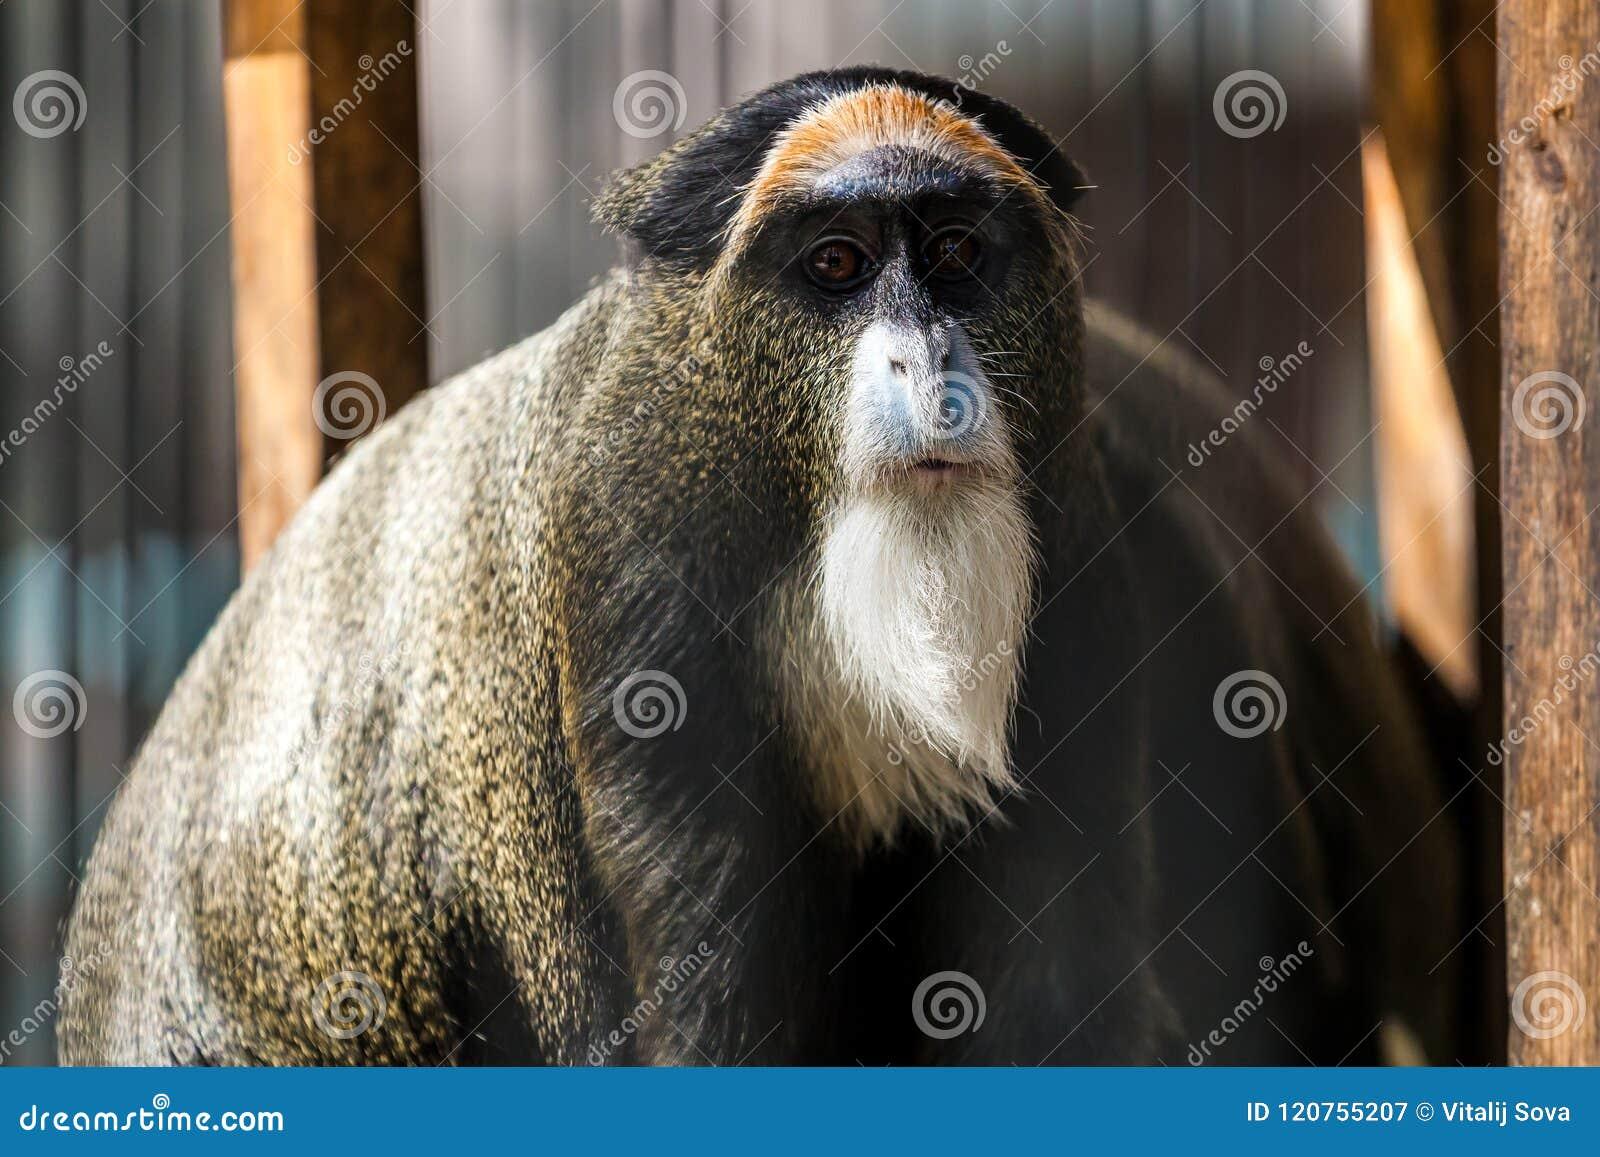 A close-up of a Monkey cerсopithecus neglectus